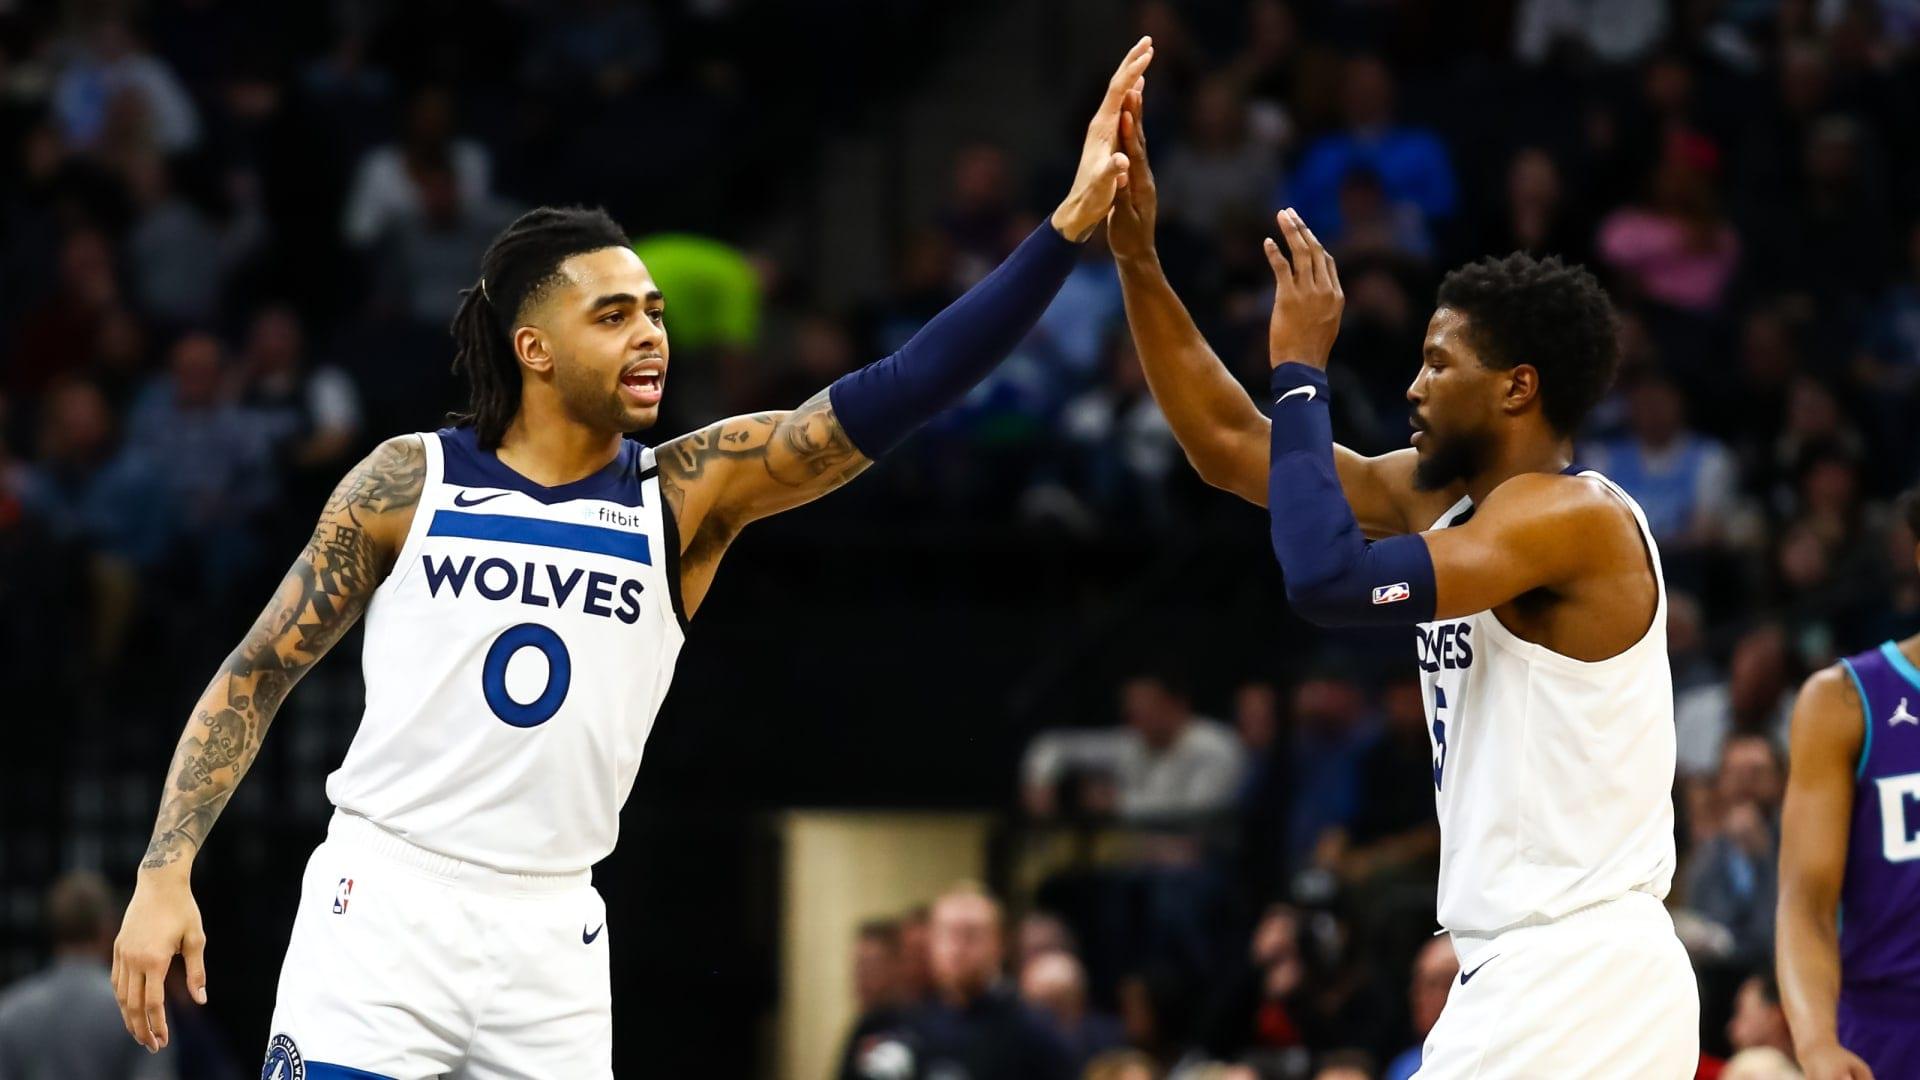 Timberwolves Vs Nets Postponed In Wake Of Daunte Wright Shooting